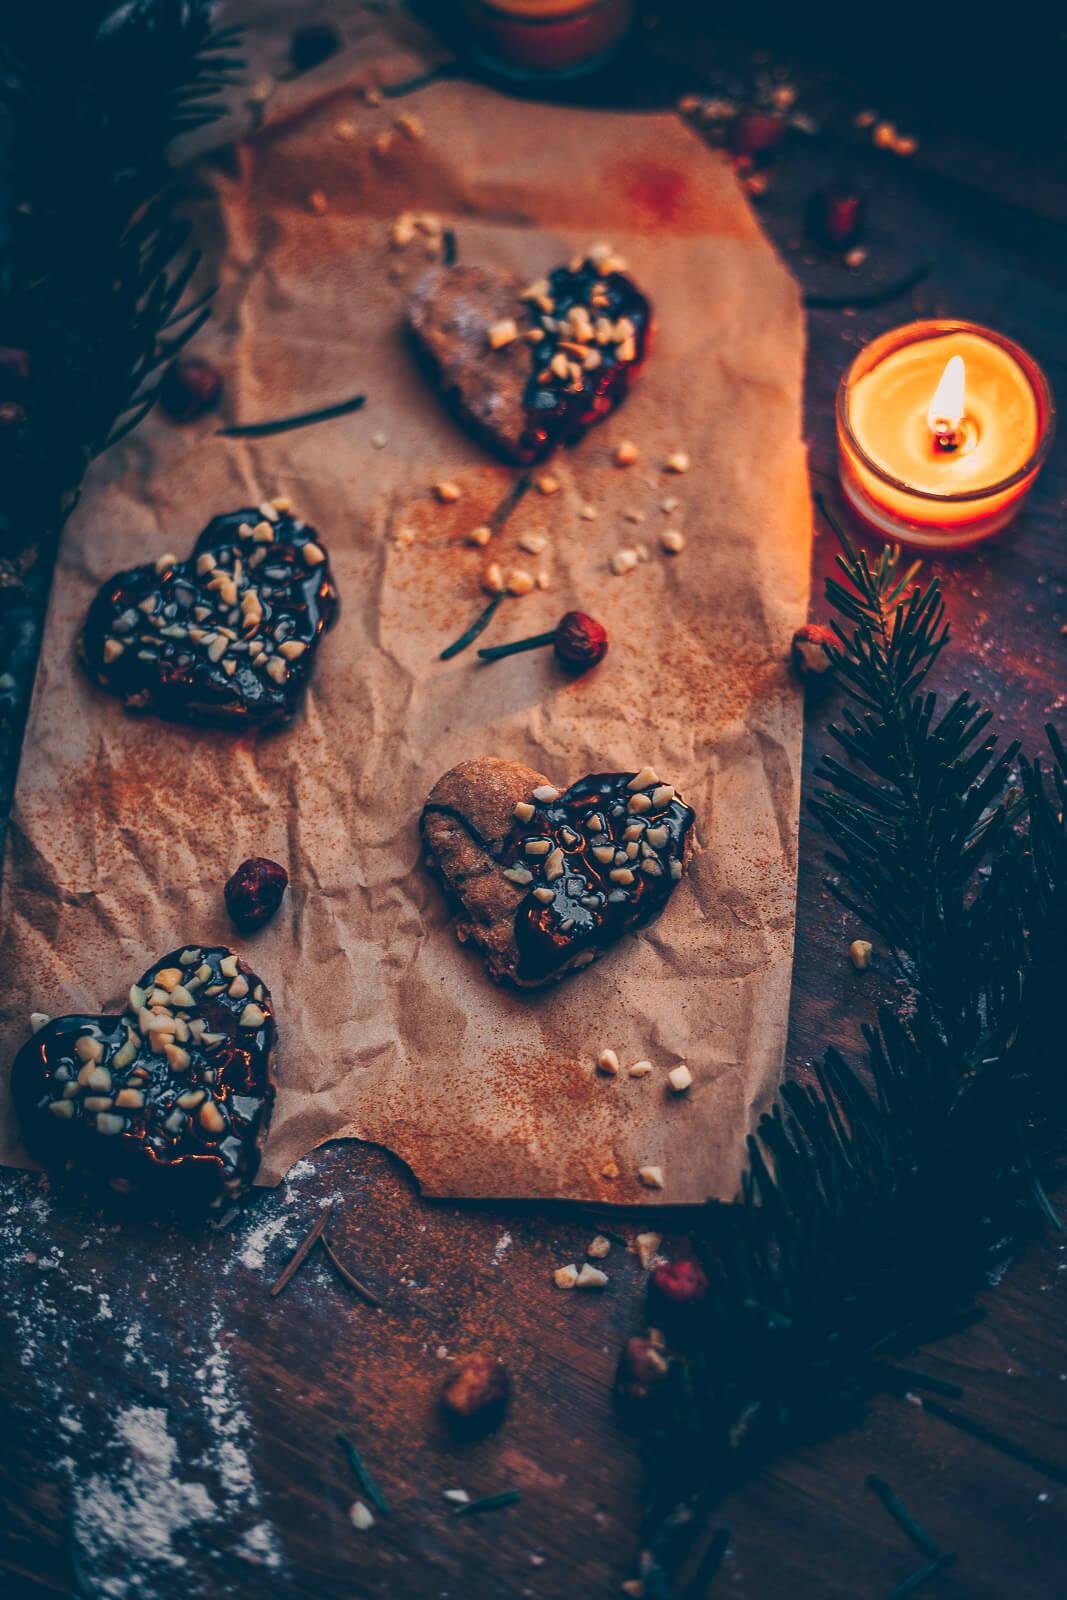 Haselnuss kekse, Haselnusskekse, Haselnuss Ausstecherle, Haselnusskekse, Haselnuss Kekse vegan, vegan Ausstecherle, vegane Kekse, Kekse vegan Nuss, Nusskekse vegan, Nusskekse Haselnuss, Cookies Weihnachten vegan, Weihnachtskekse vegan, Weihnachtskekse mit Nuss, nussige Kekse, Weihnachtskekse vegan Haselnuss